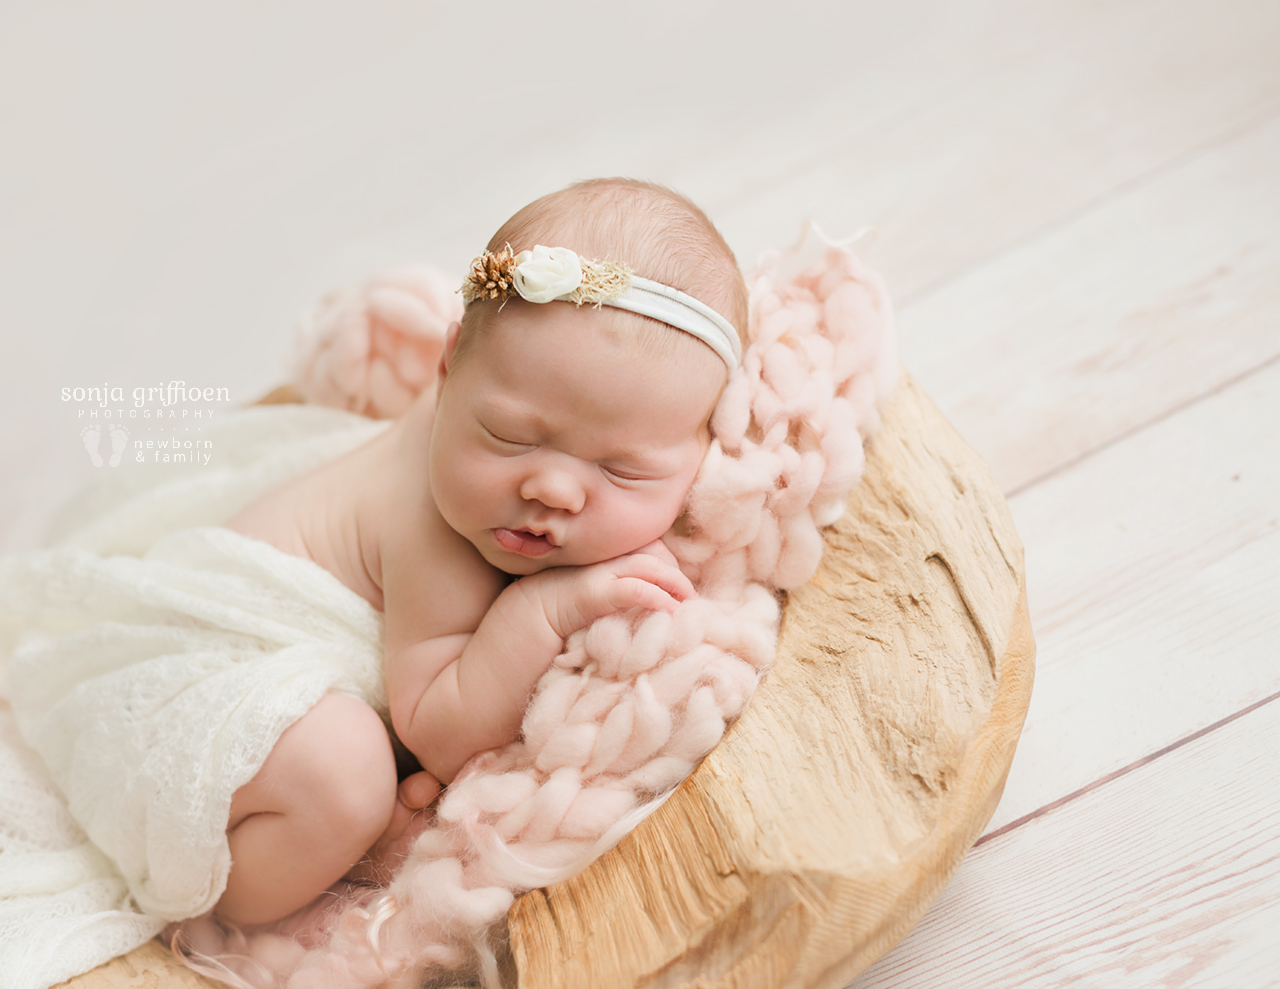 Matilda-Newborn-Brisbane-Newborn-Photographer-Sonja-Griffioen-18.jpg